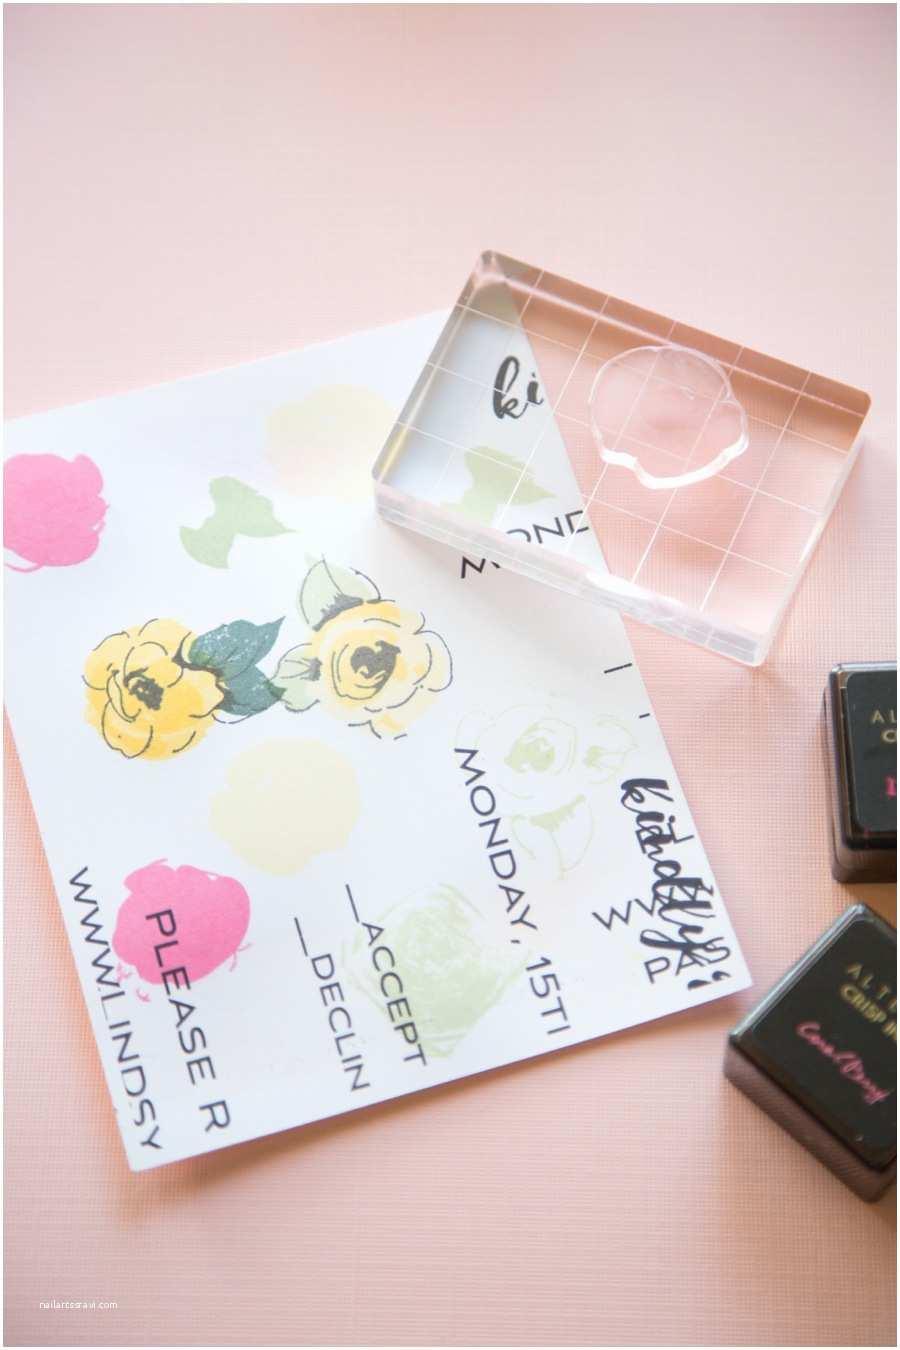 How to Design Wedding Invitations Tips Diy Wedding Invitation Kits Free with Looking Design